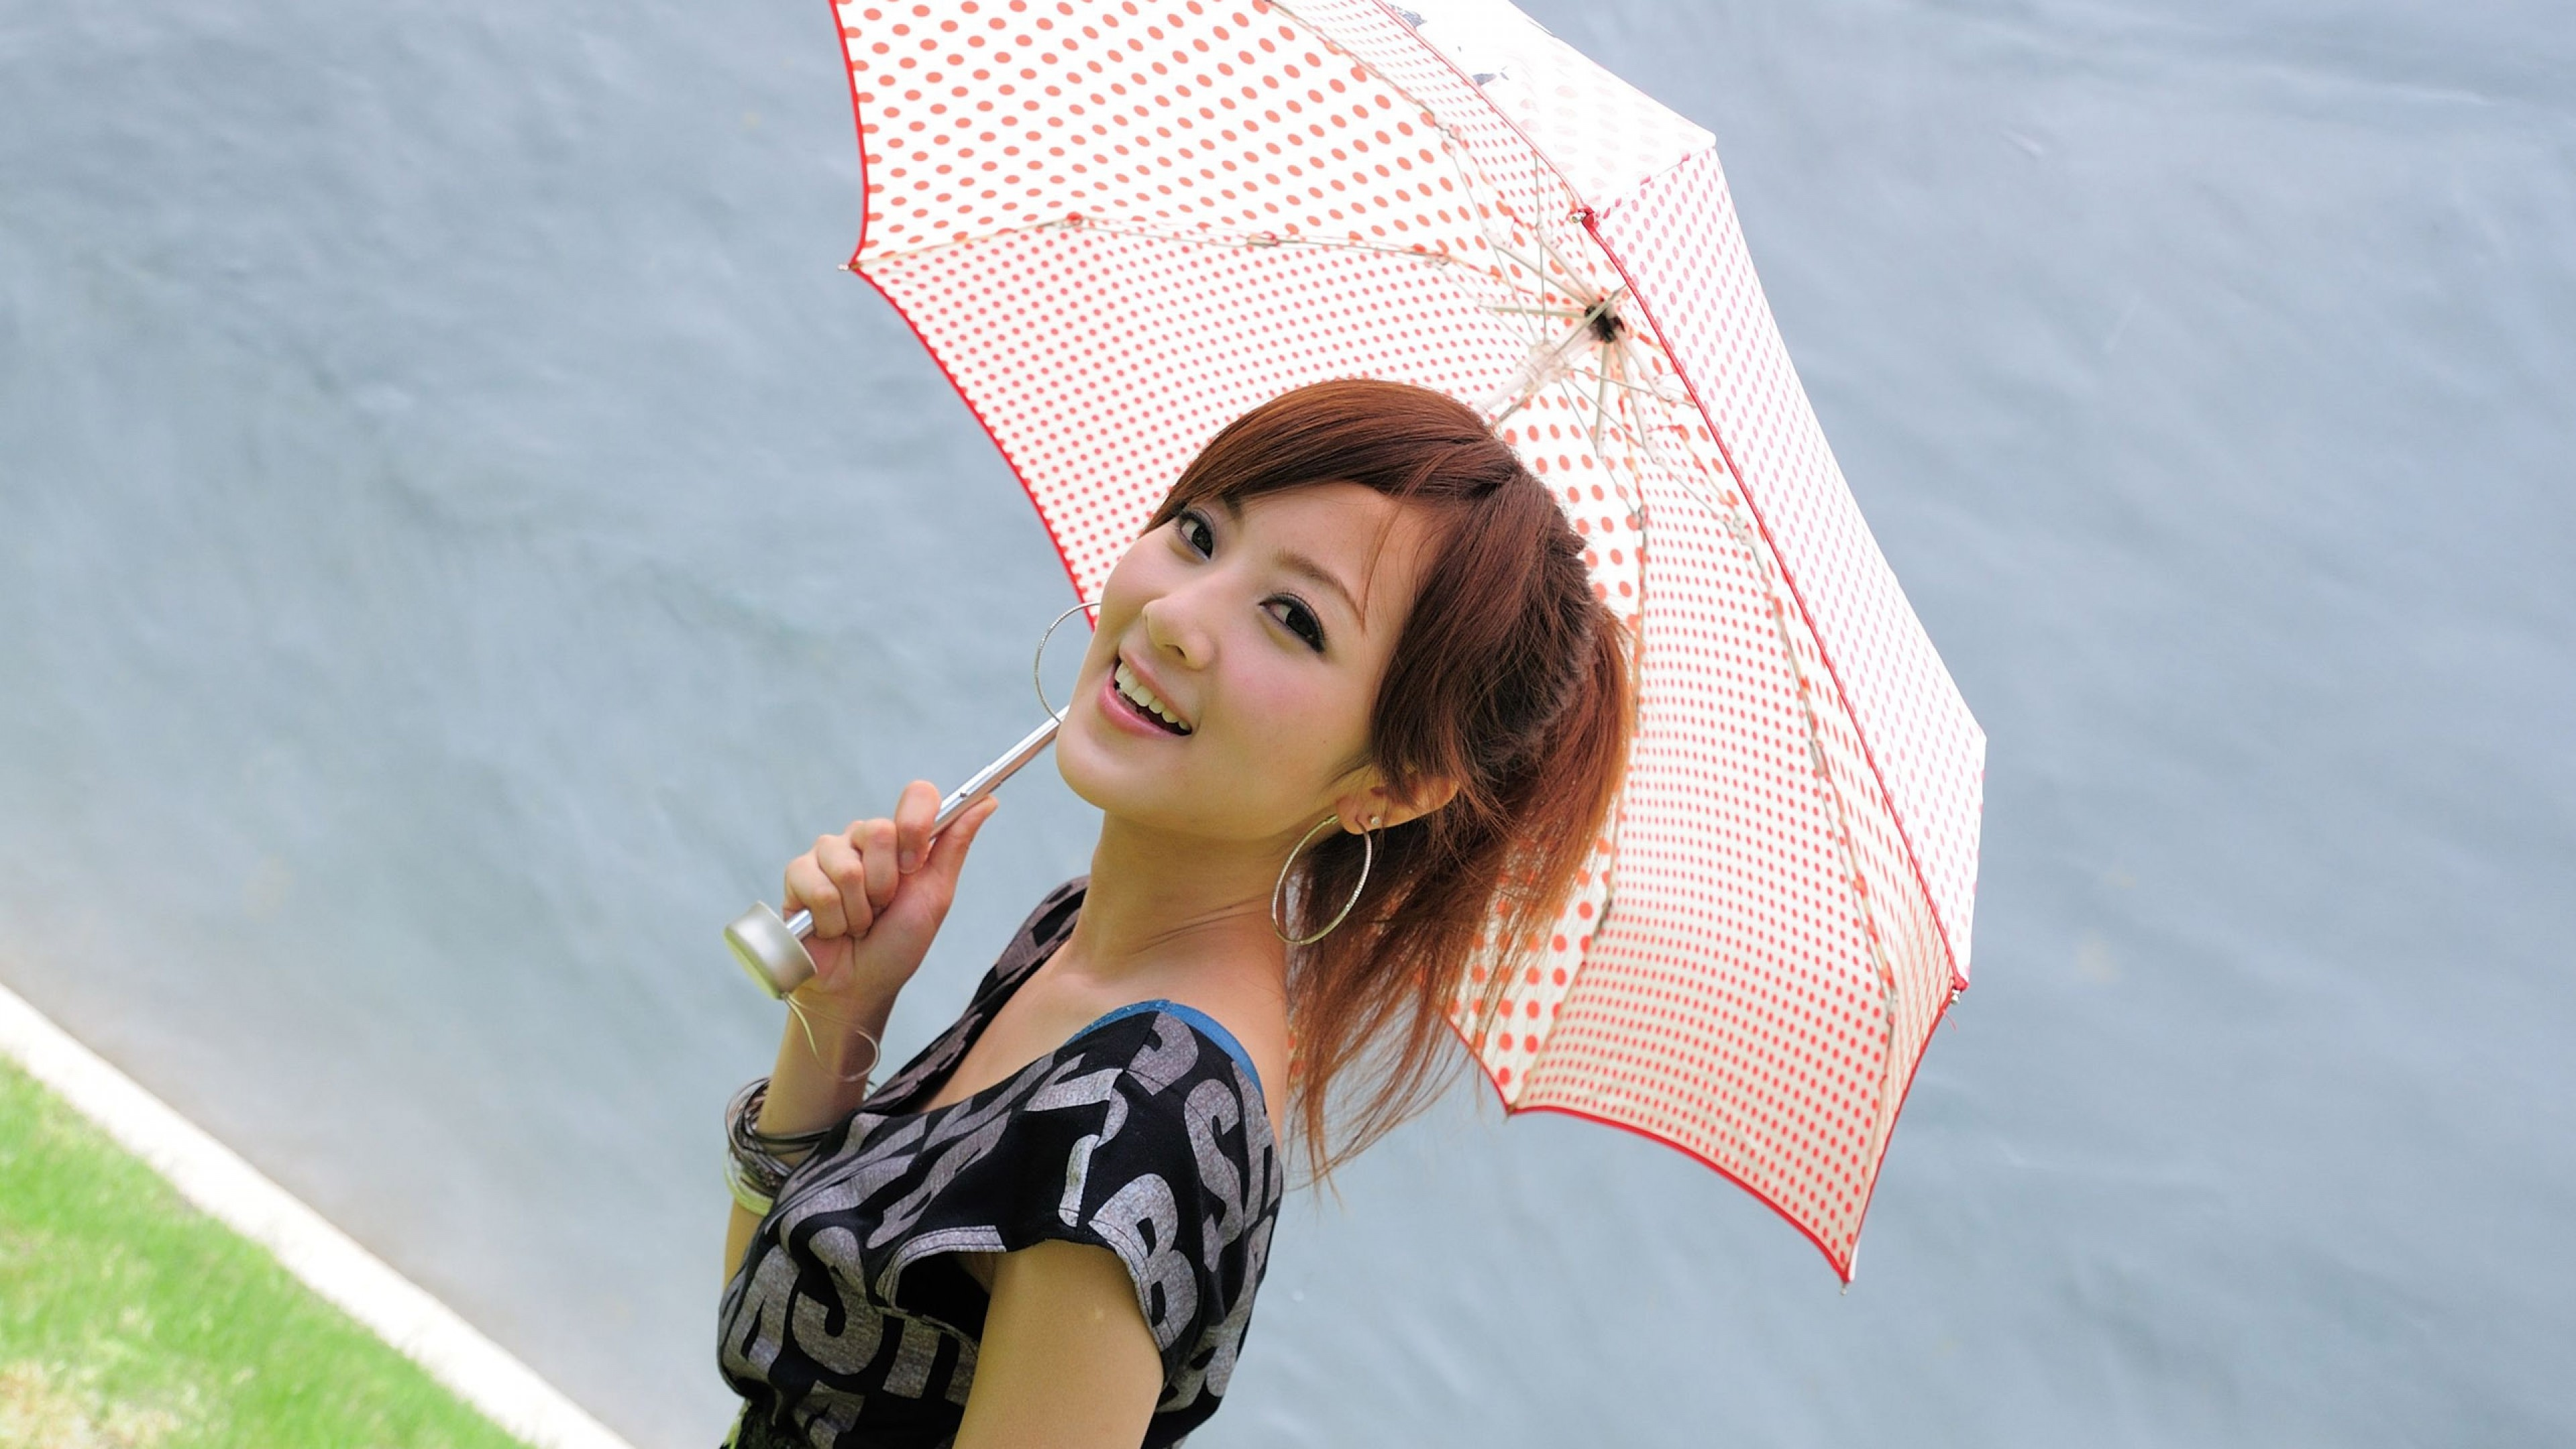 Smiling Cute Asian Girl Hd Wallpaper 4k Ultra Hd Hd Wallpaper